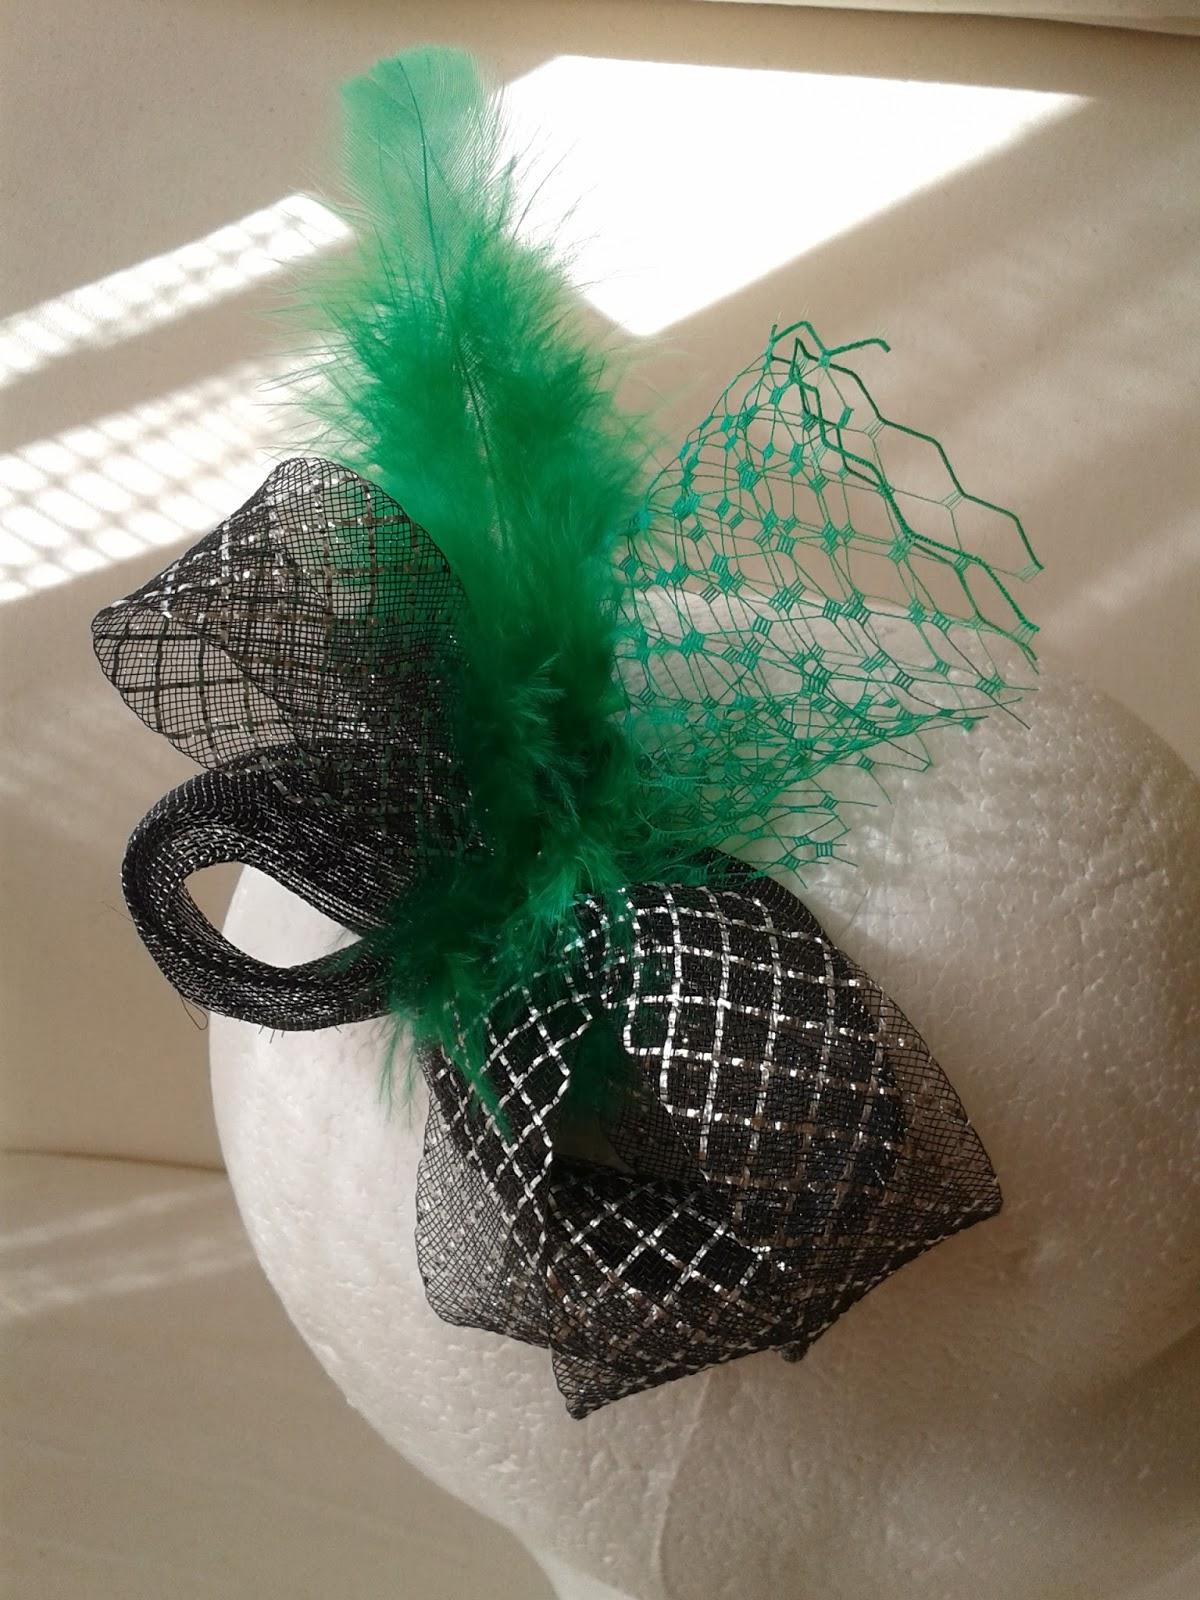 tocado barato, tocados económicos, tocado color plata, tocado color verde, plumas verdes